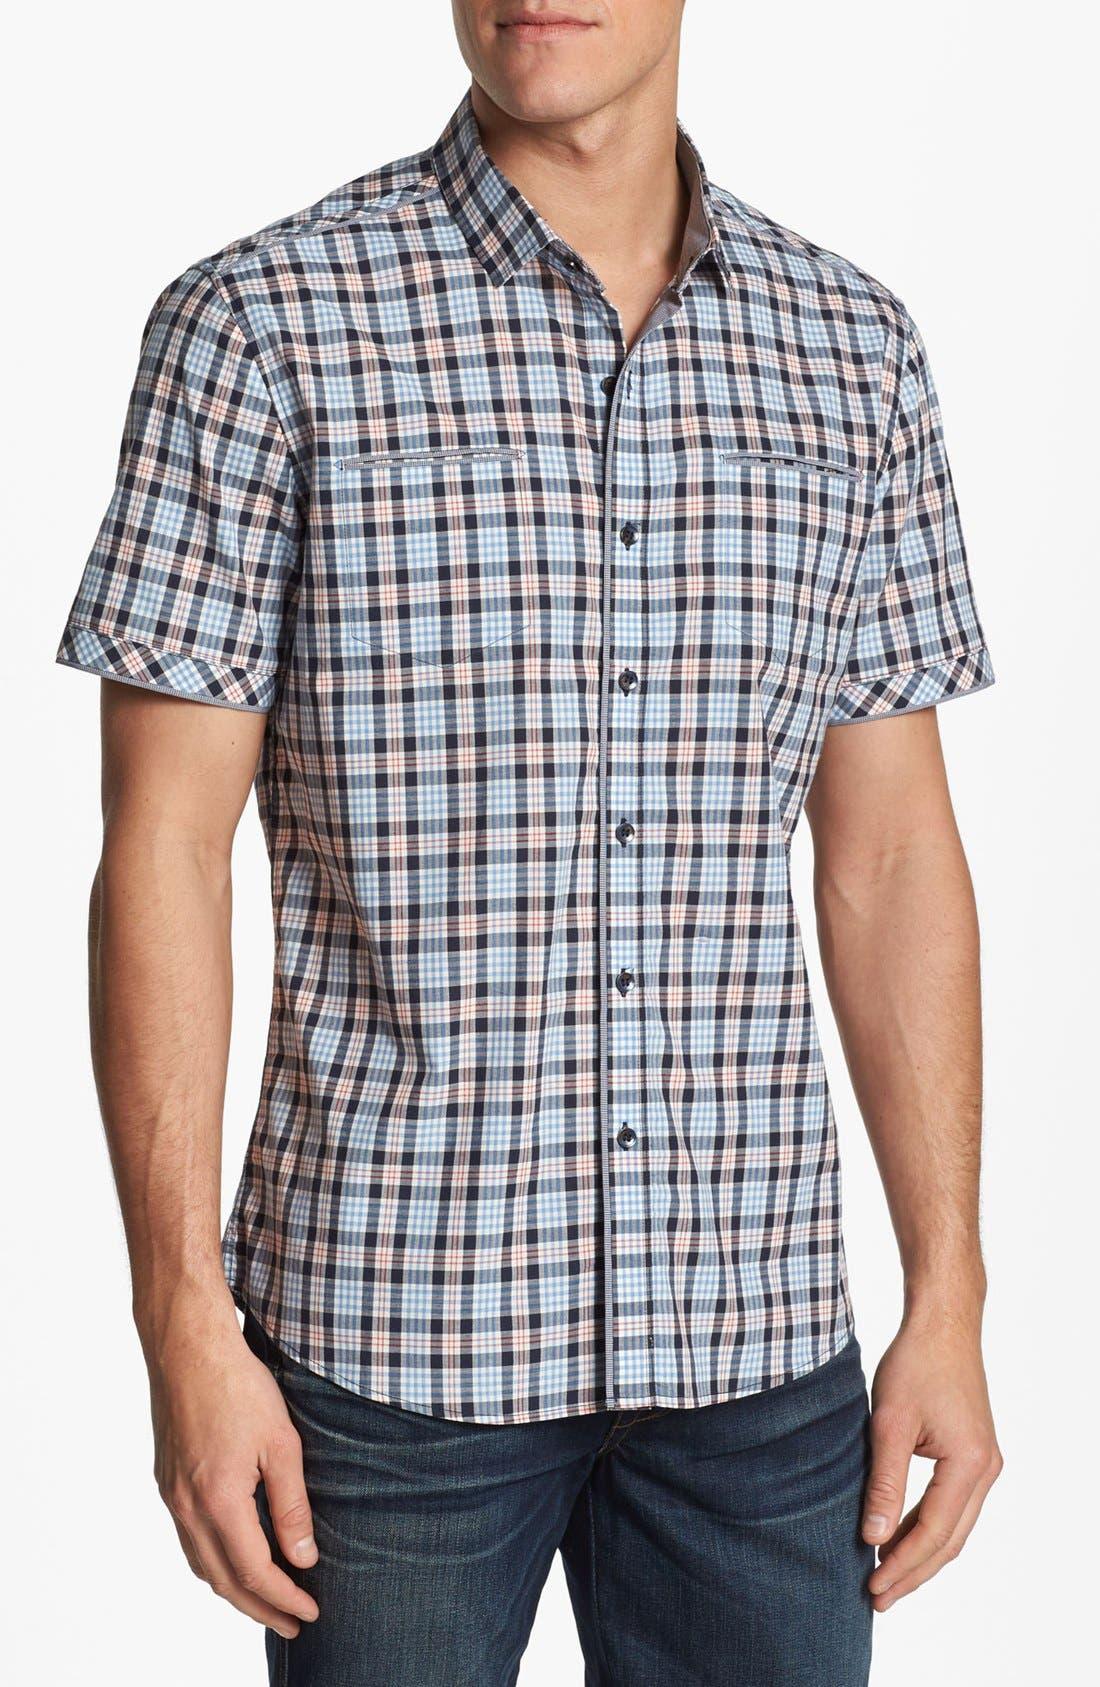 Alternate Image 1 Selected - 7 Diamonds 'Sweet Nothing' Plaid Woven Short Sleeve Shirt